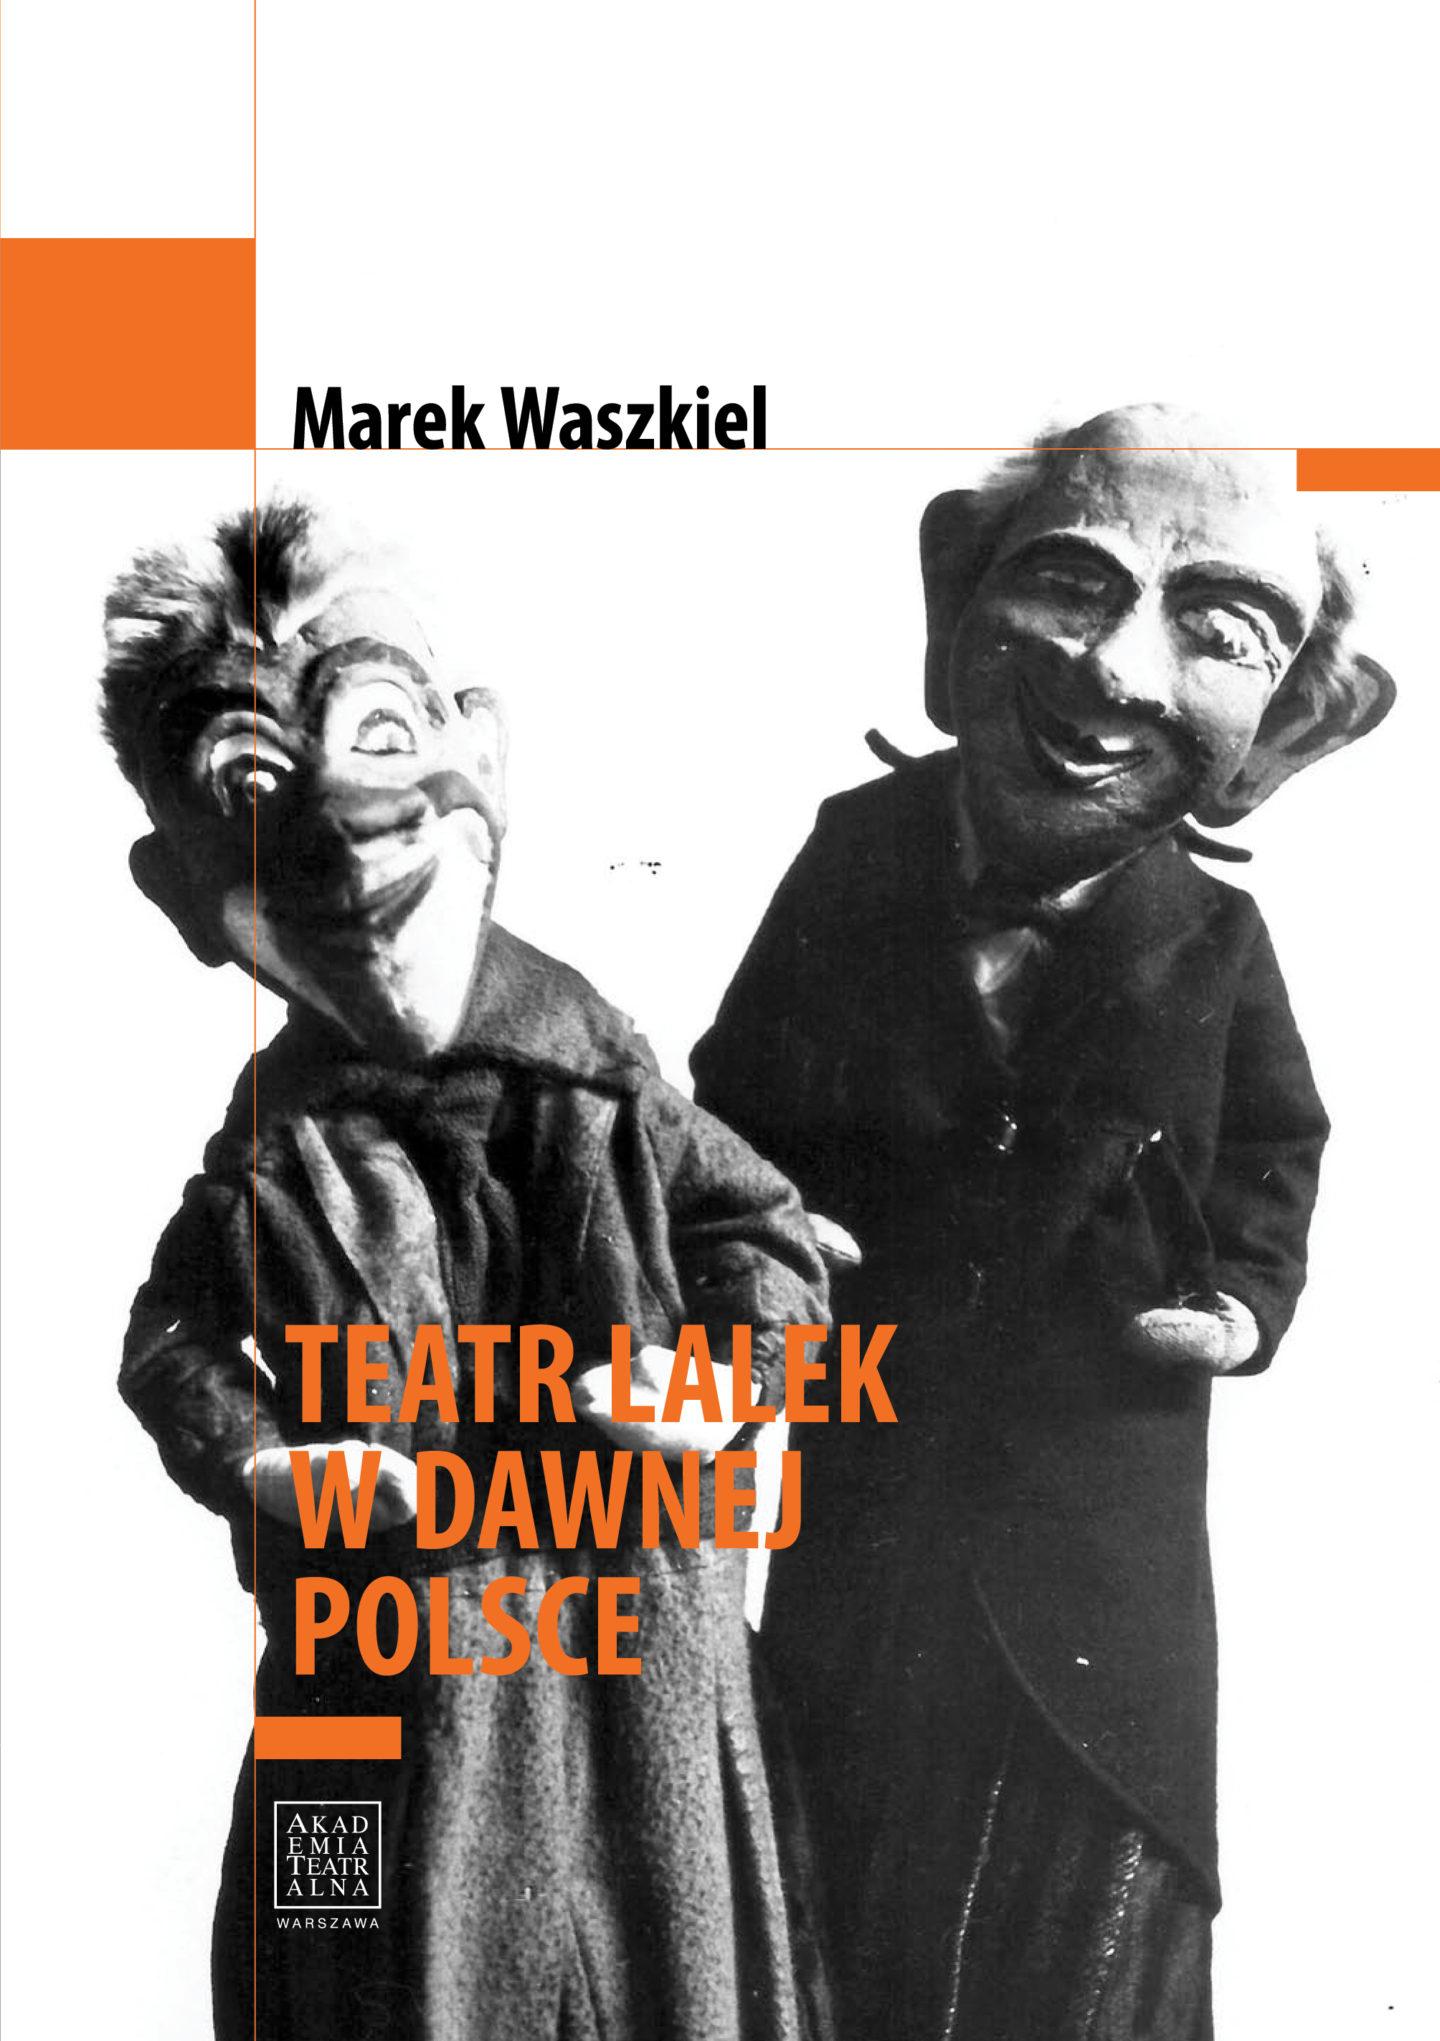 TEATR LALEK WDAWNEJ POLSCE <br> Marek Waszkiel